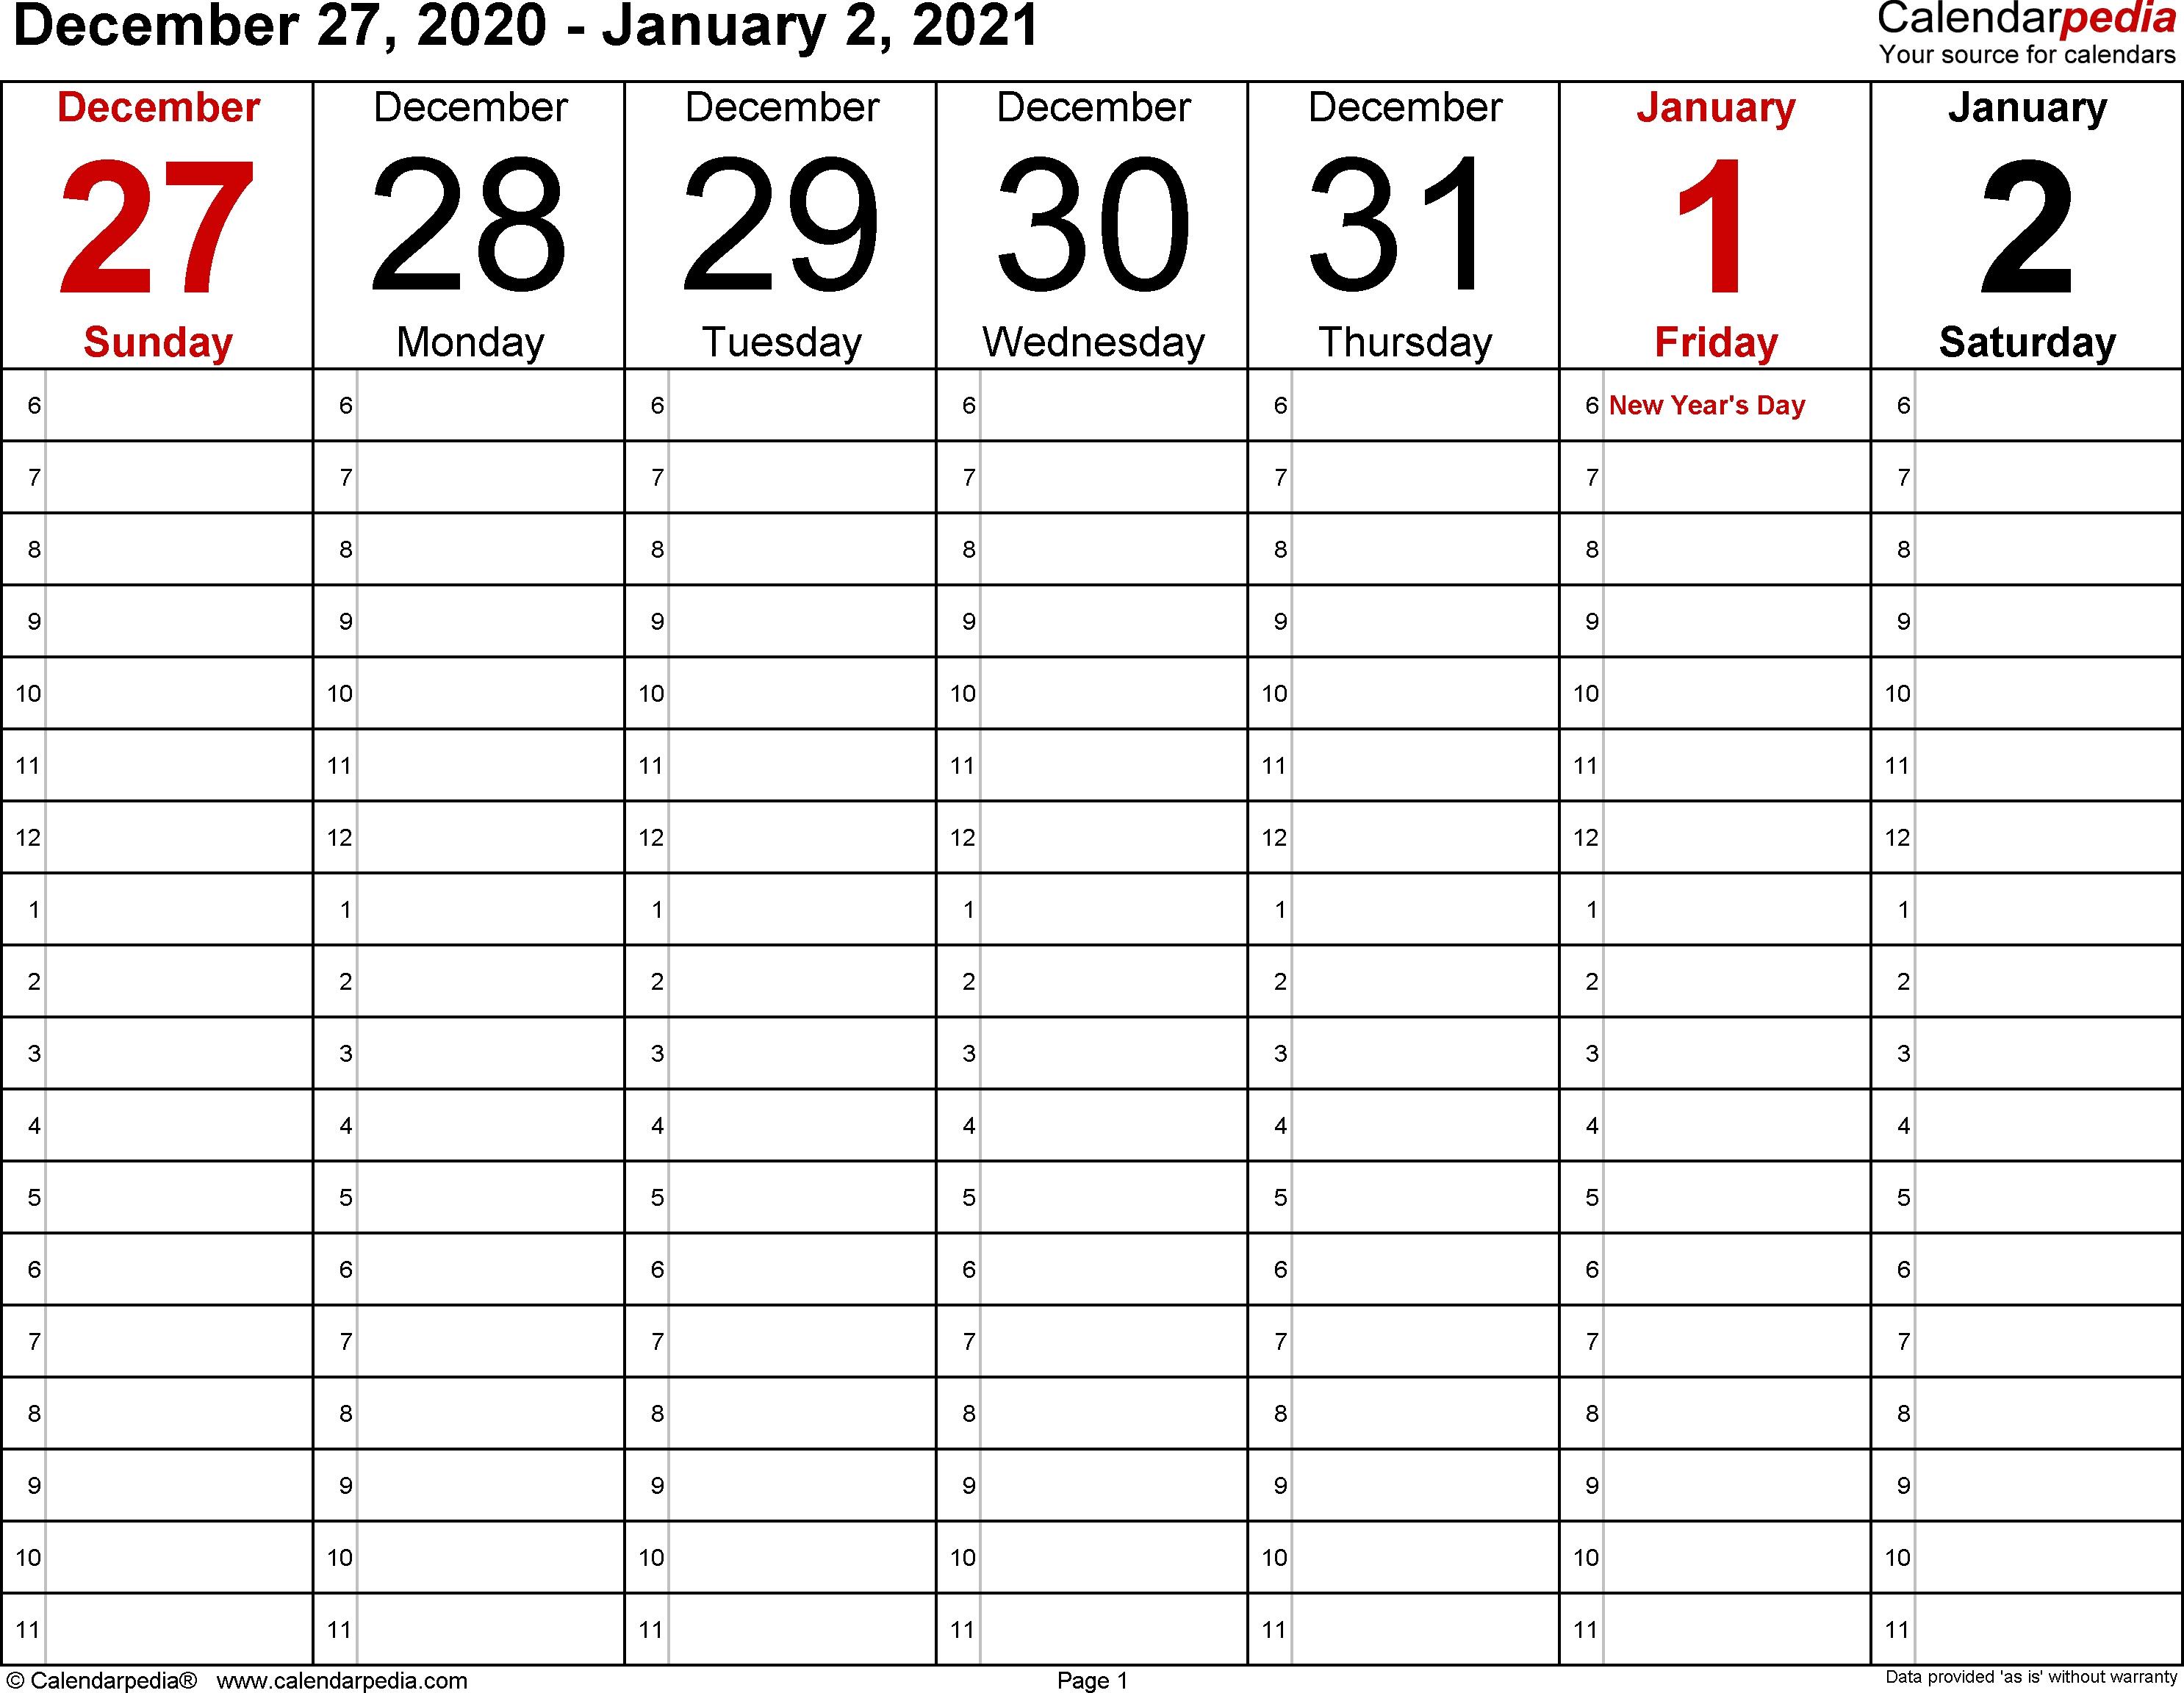 Calendarpedia - Your Source For Calendars Perky Calendarpedia 2020 Printable South Africa